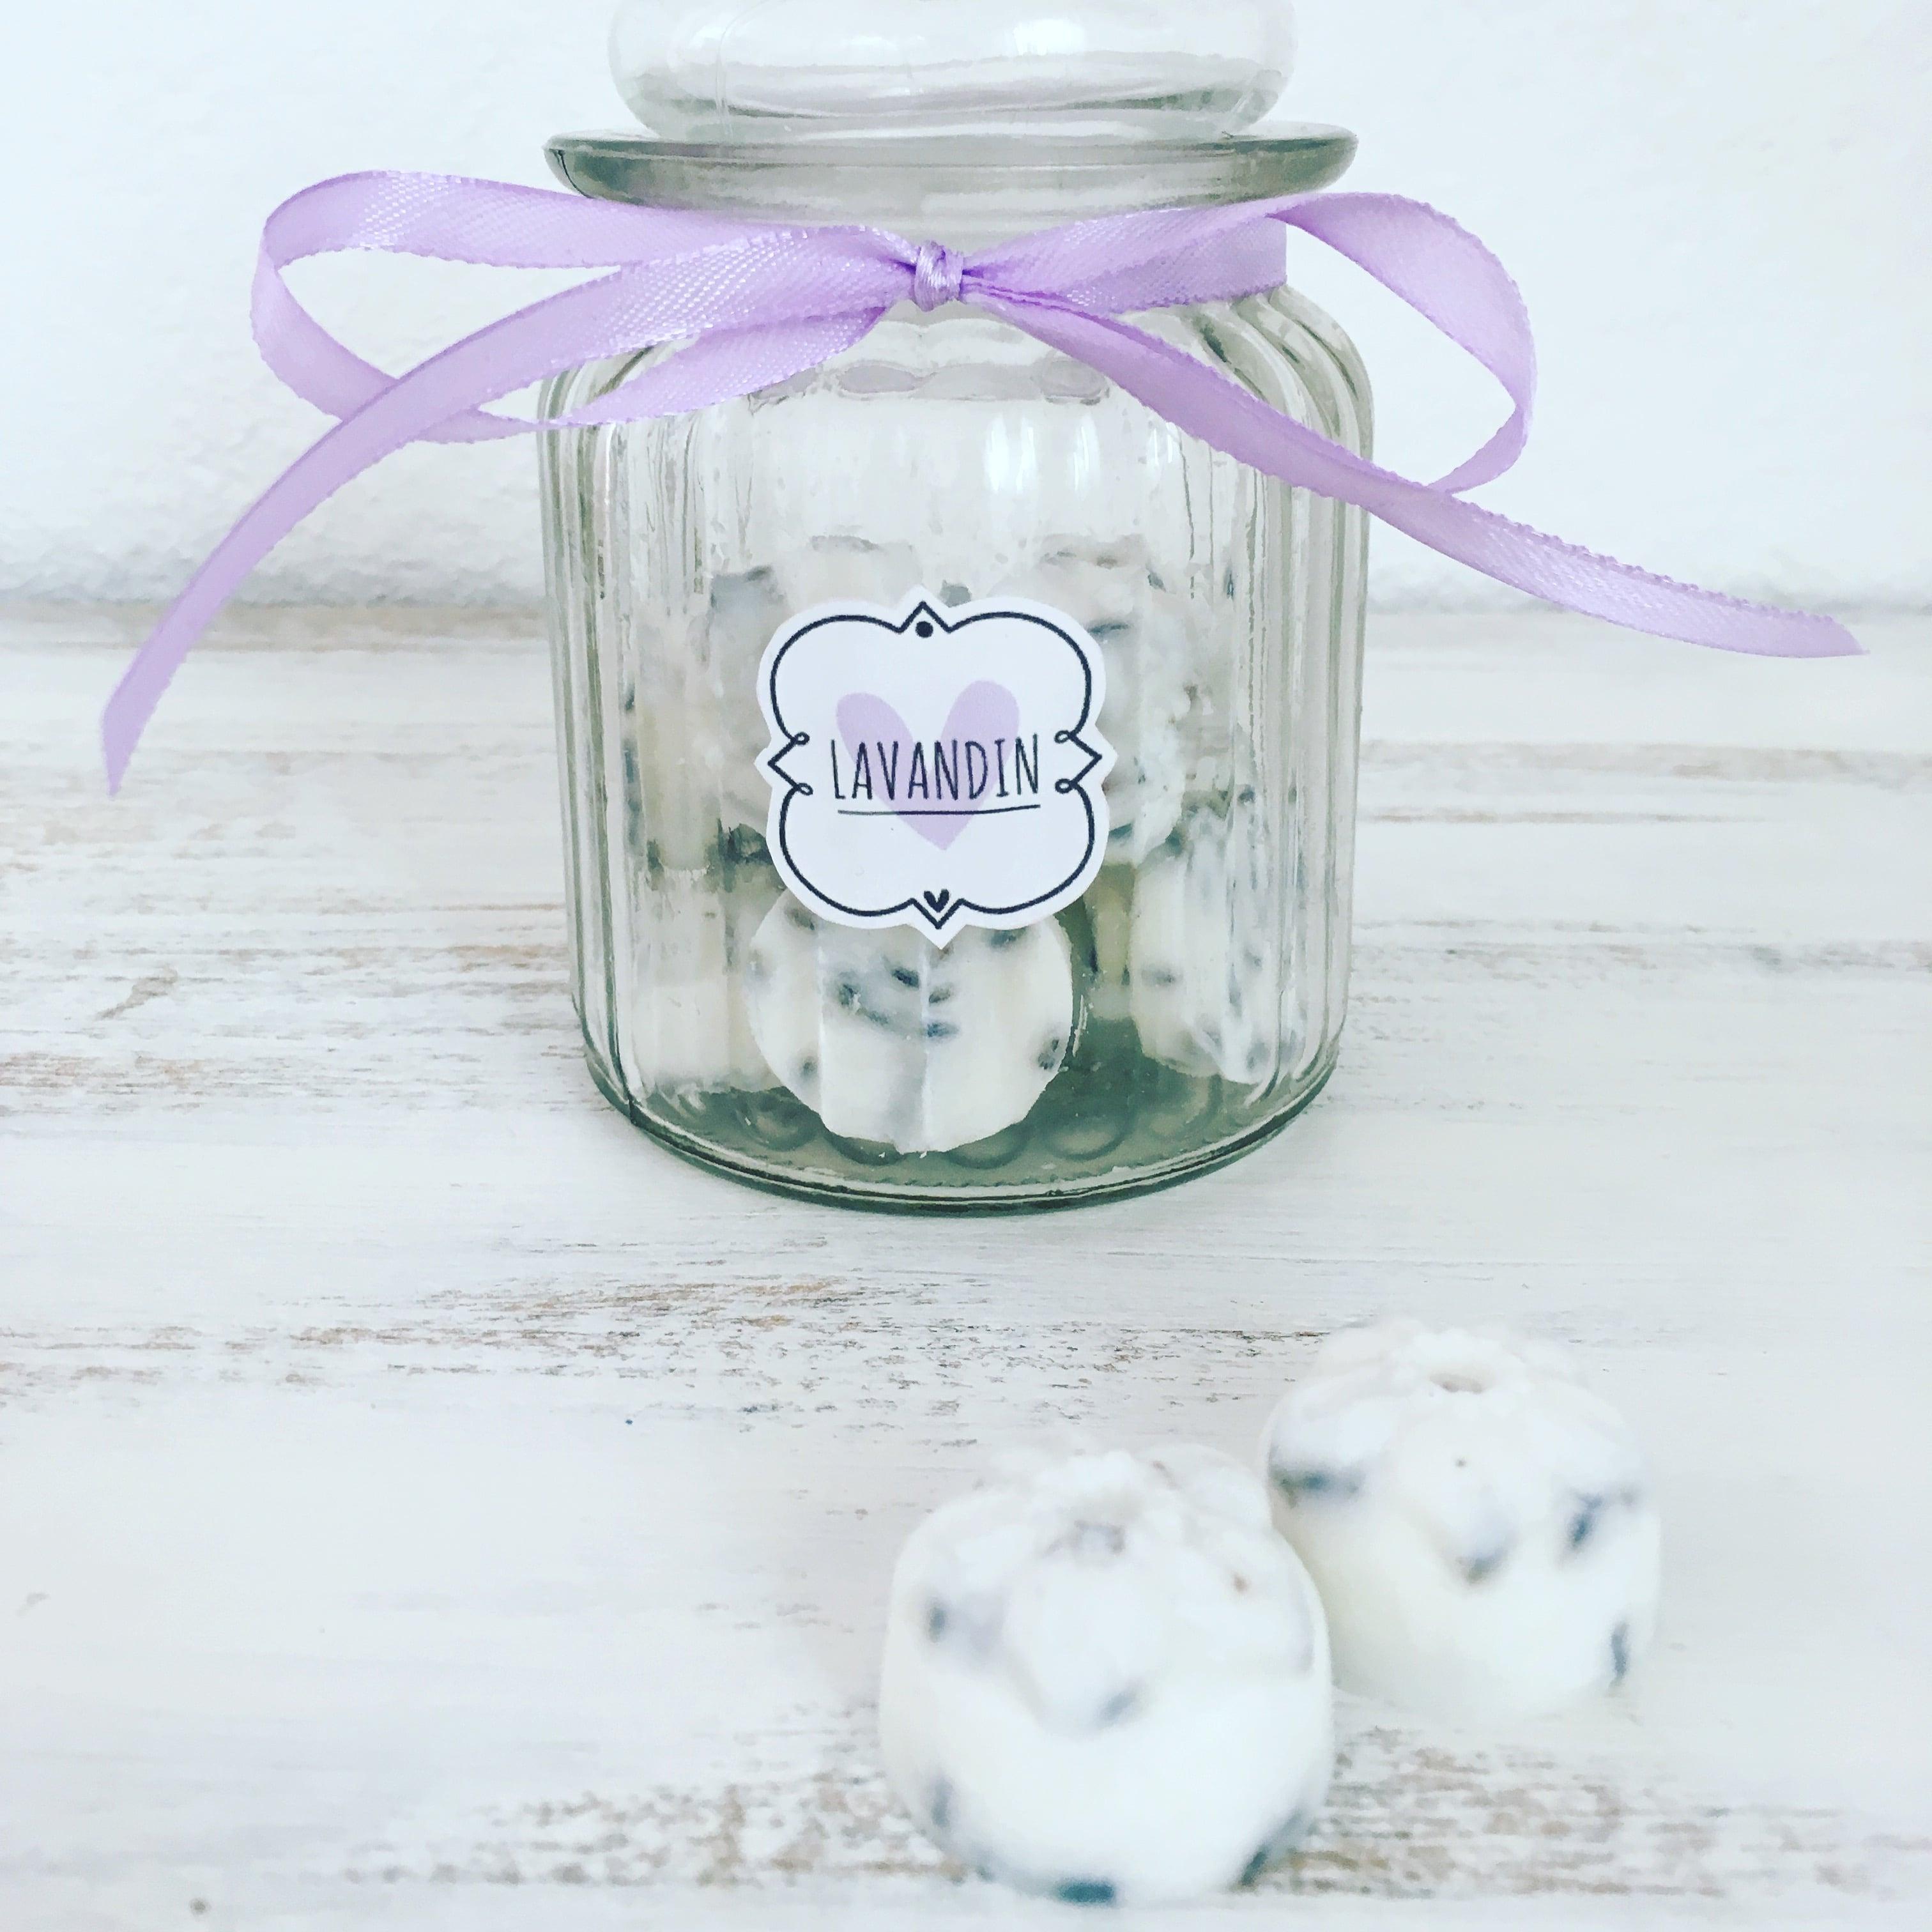 LAVANDIN- Jar of 15 Lavandin of Provence Scented Natural Wax Melts ...